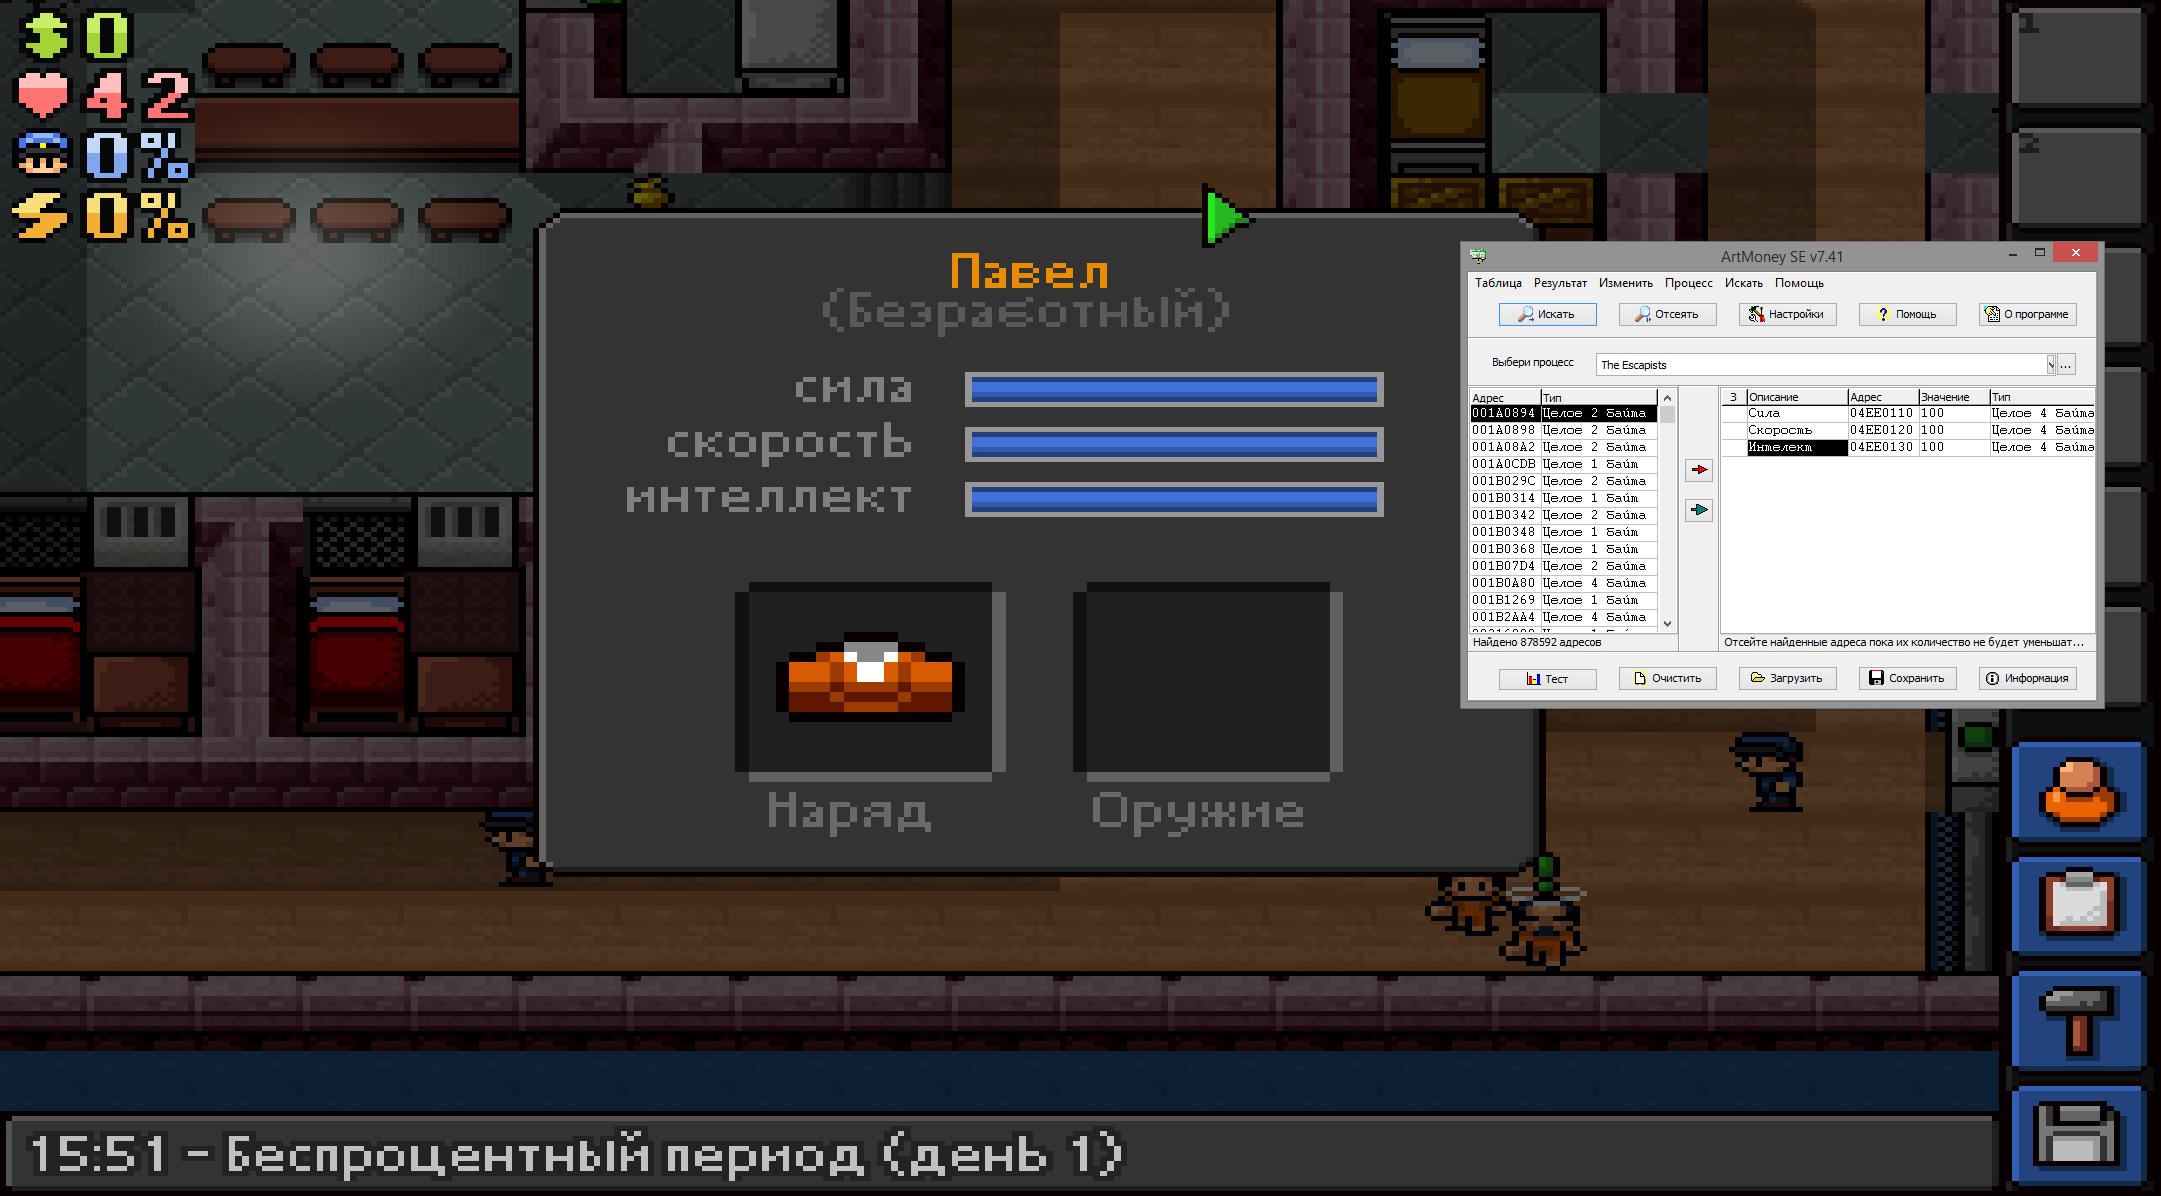 Артмани на русском для пк